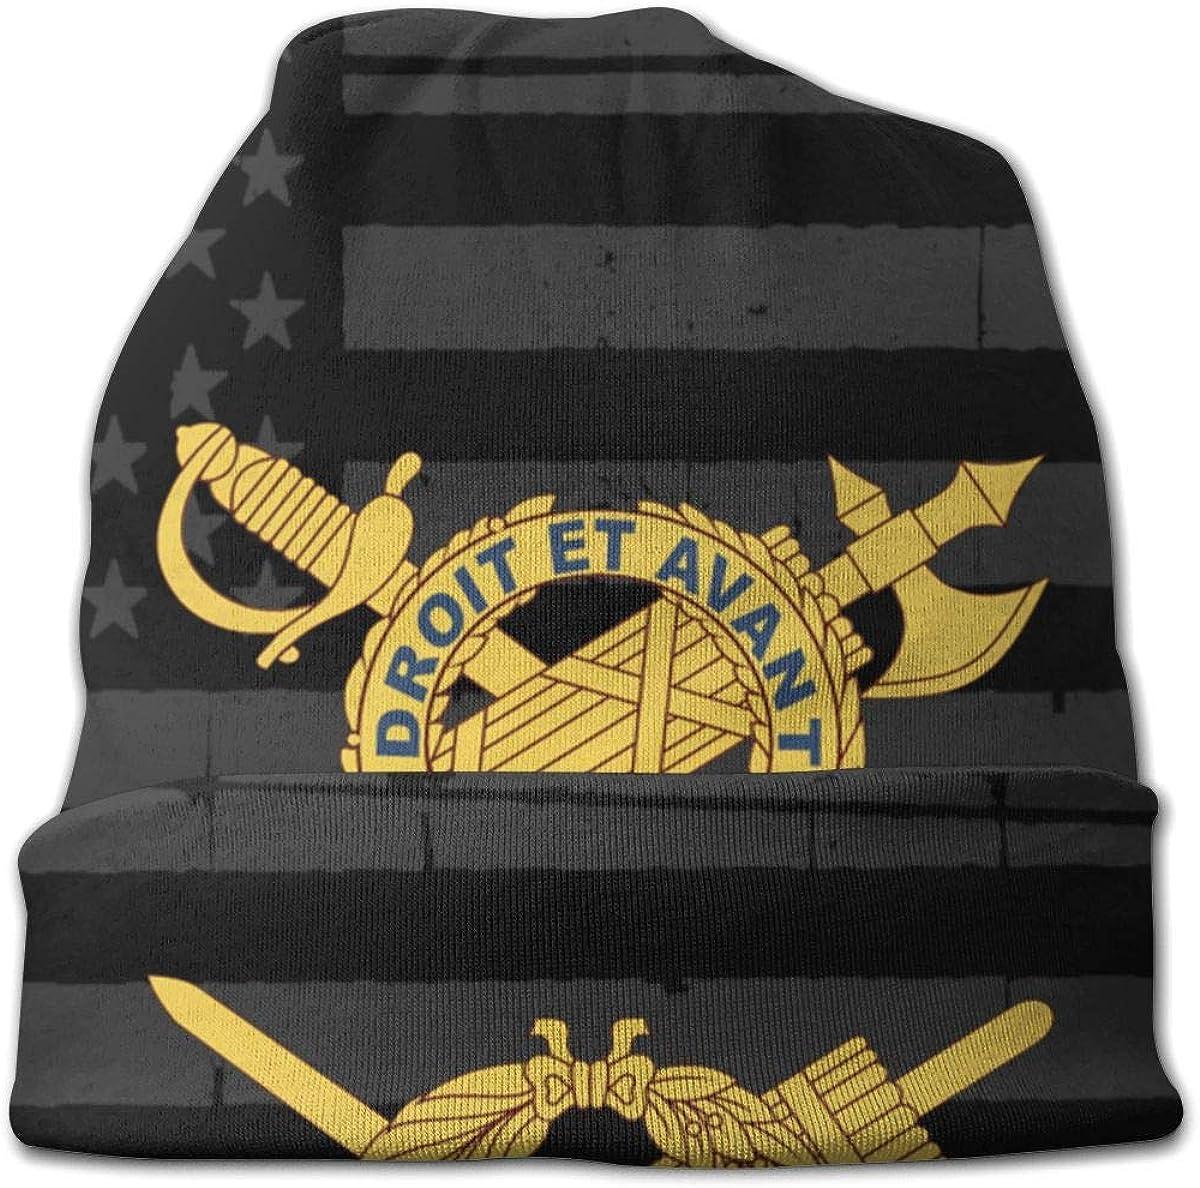 JINGUImao US Army Inspector General 1 Unisex Warm Hat Knit Hat Skull Cap Beanies Cap